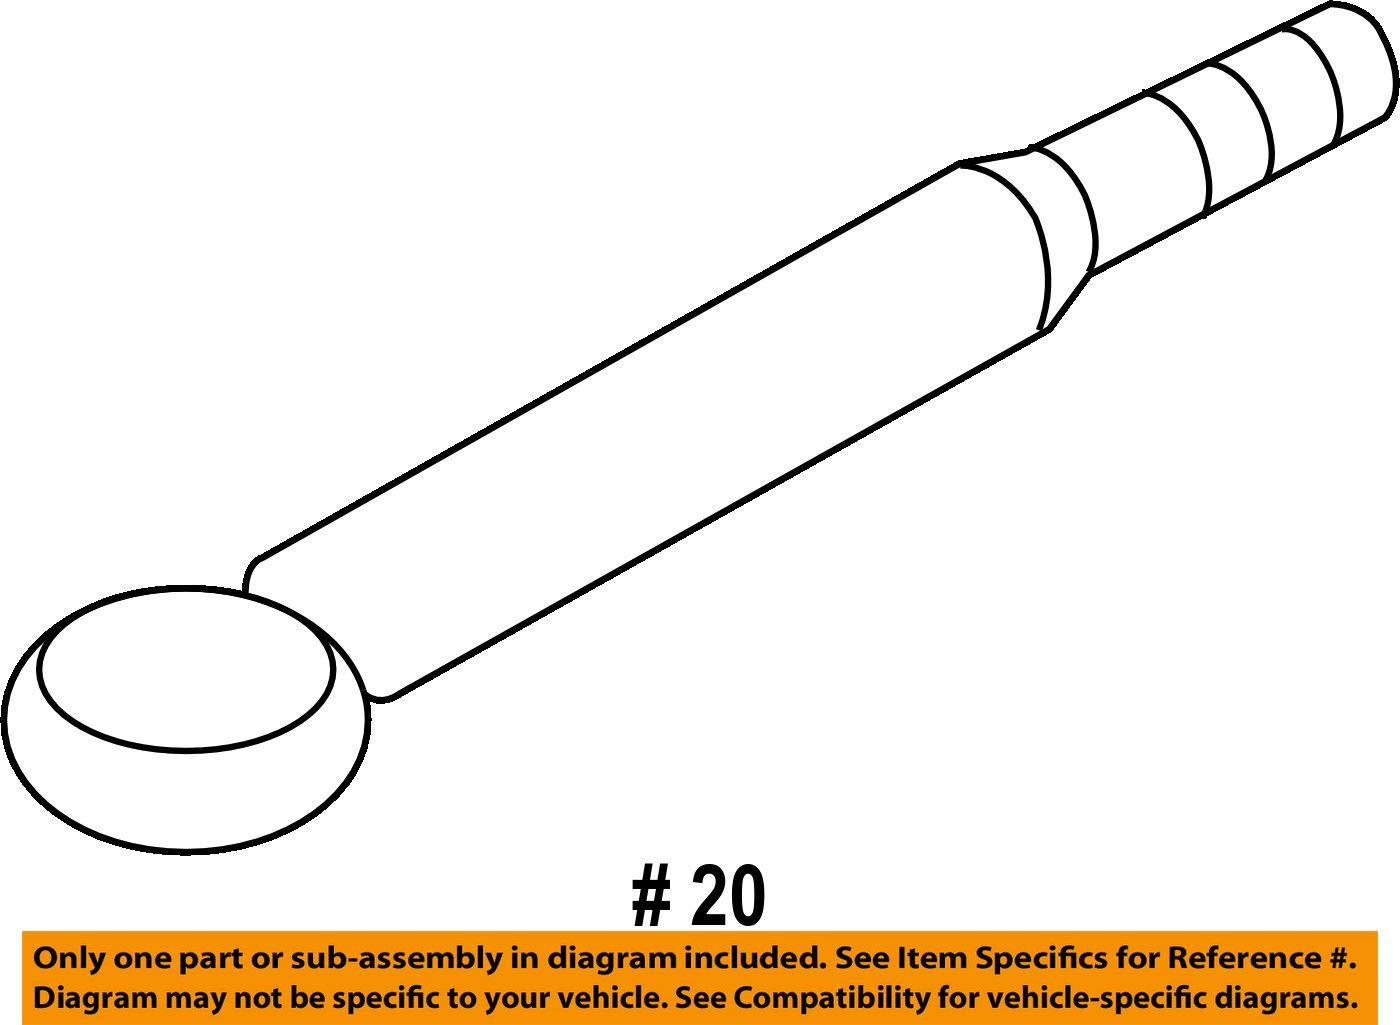 Subaru Oem 14 15 Forester Floor Rails Rear Tie Down Hook Axle Diagram Left 57805fg000 Automotive